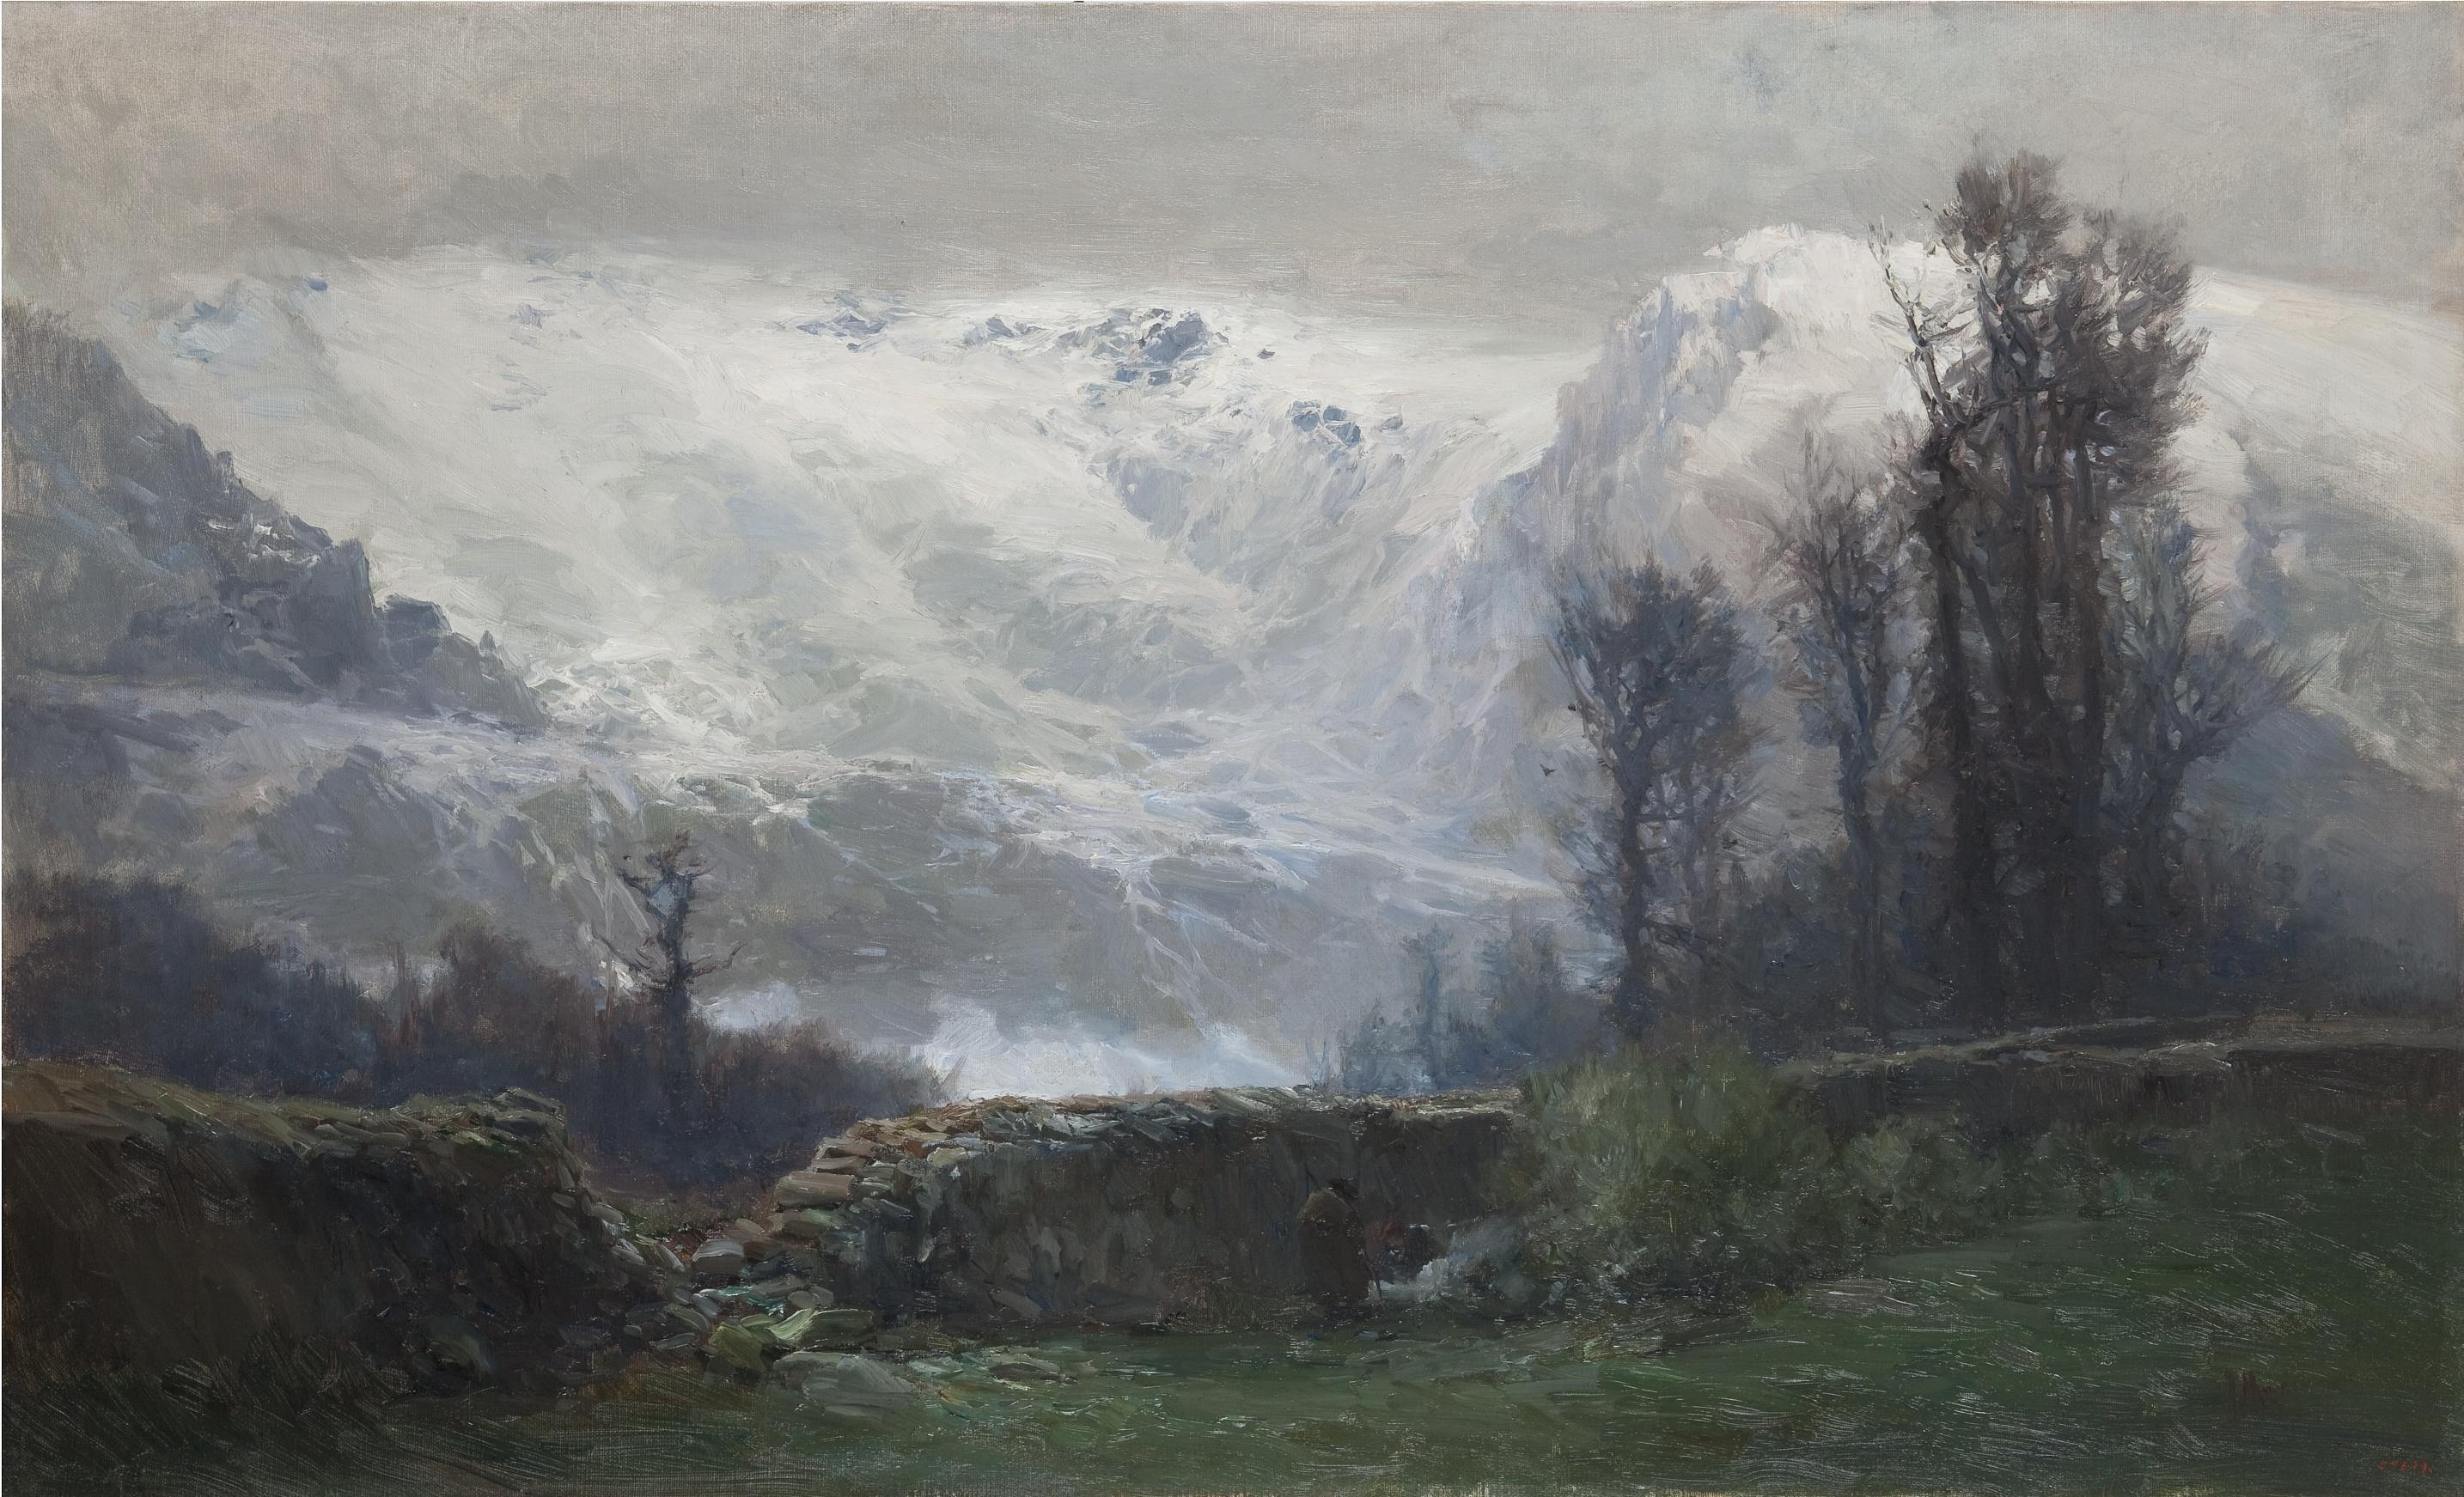 Valle de Chozas de la Sierra, Guadarrama, Jaume Morera